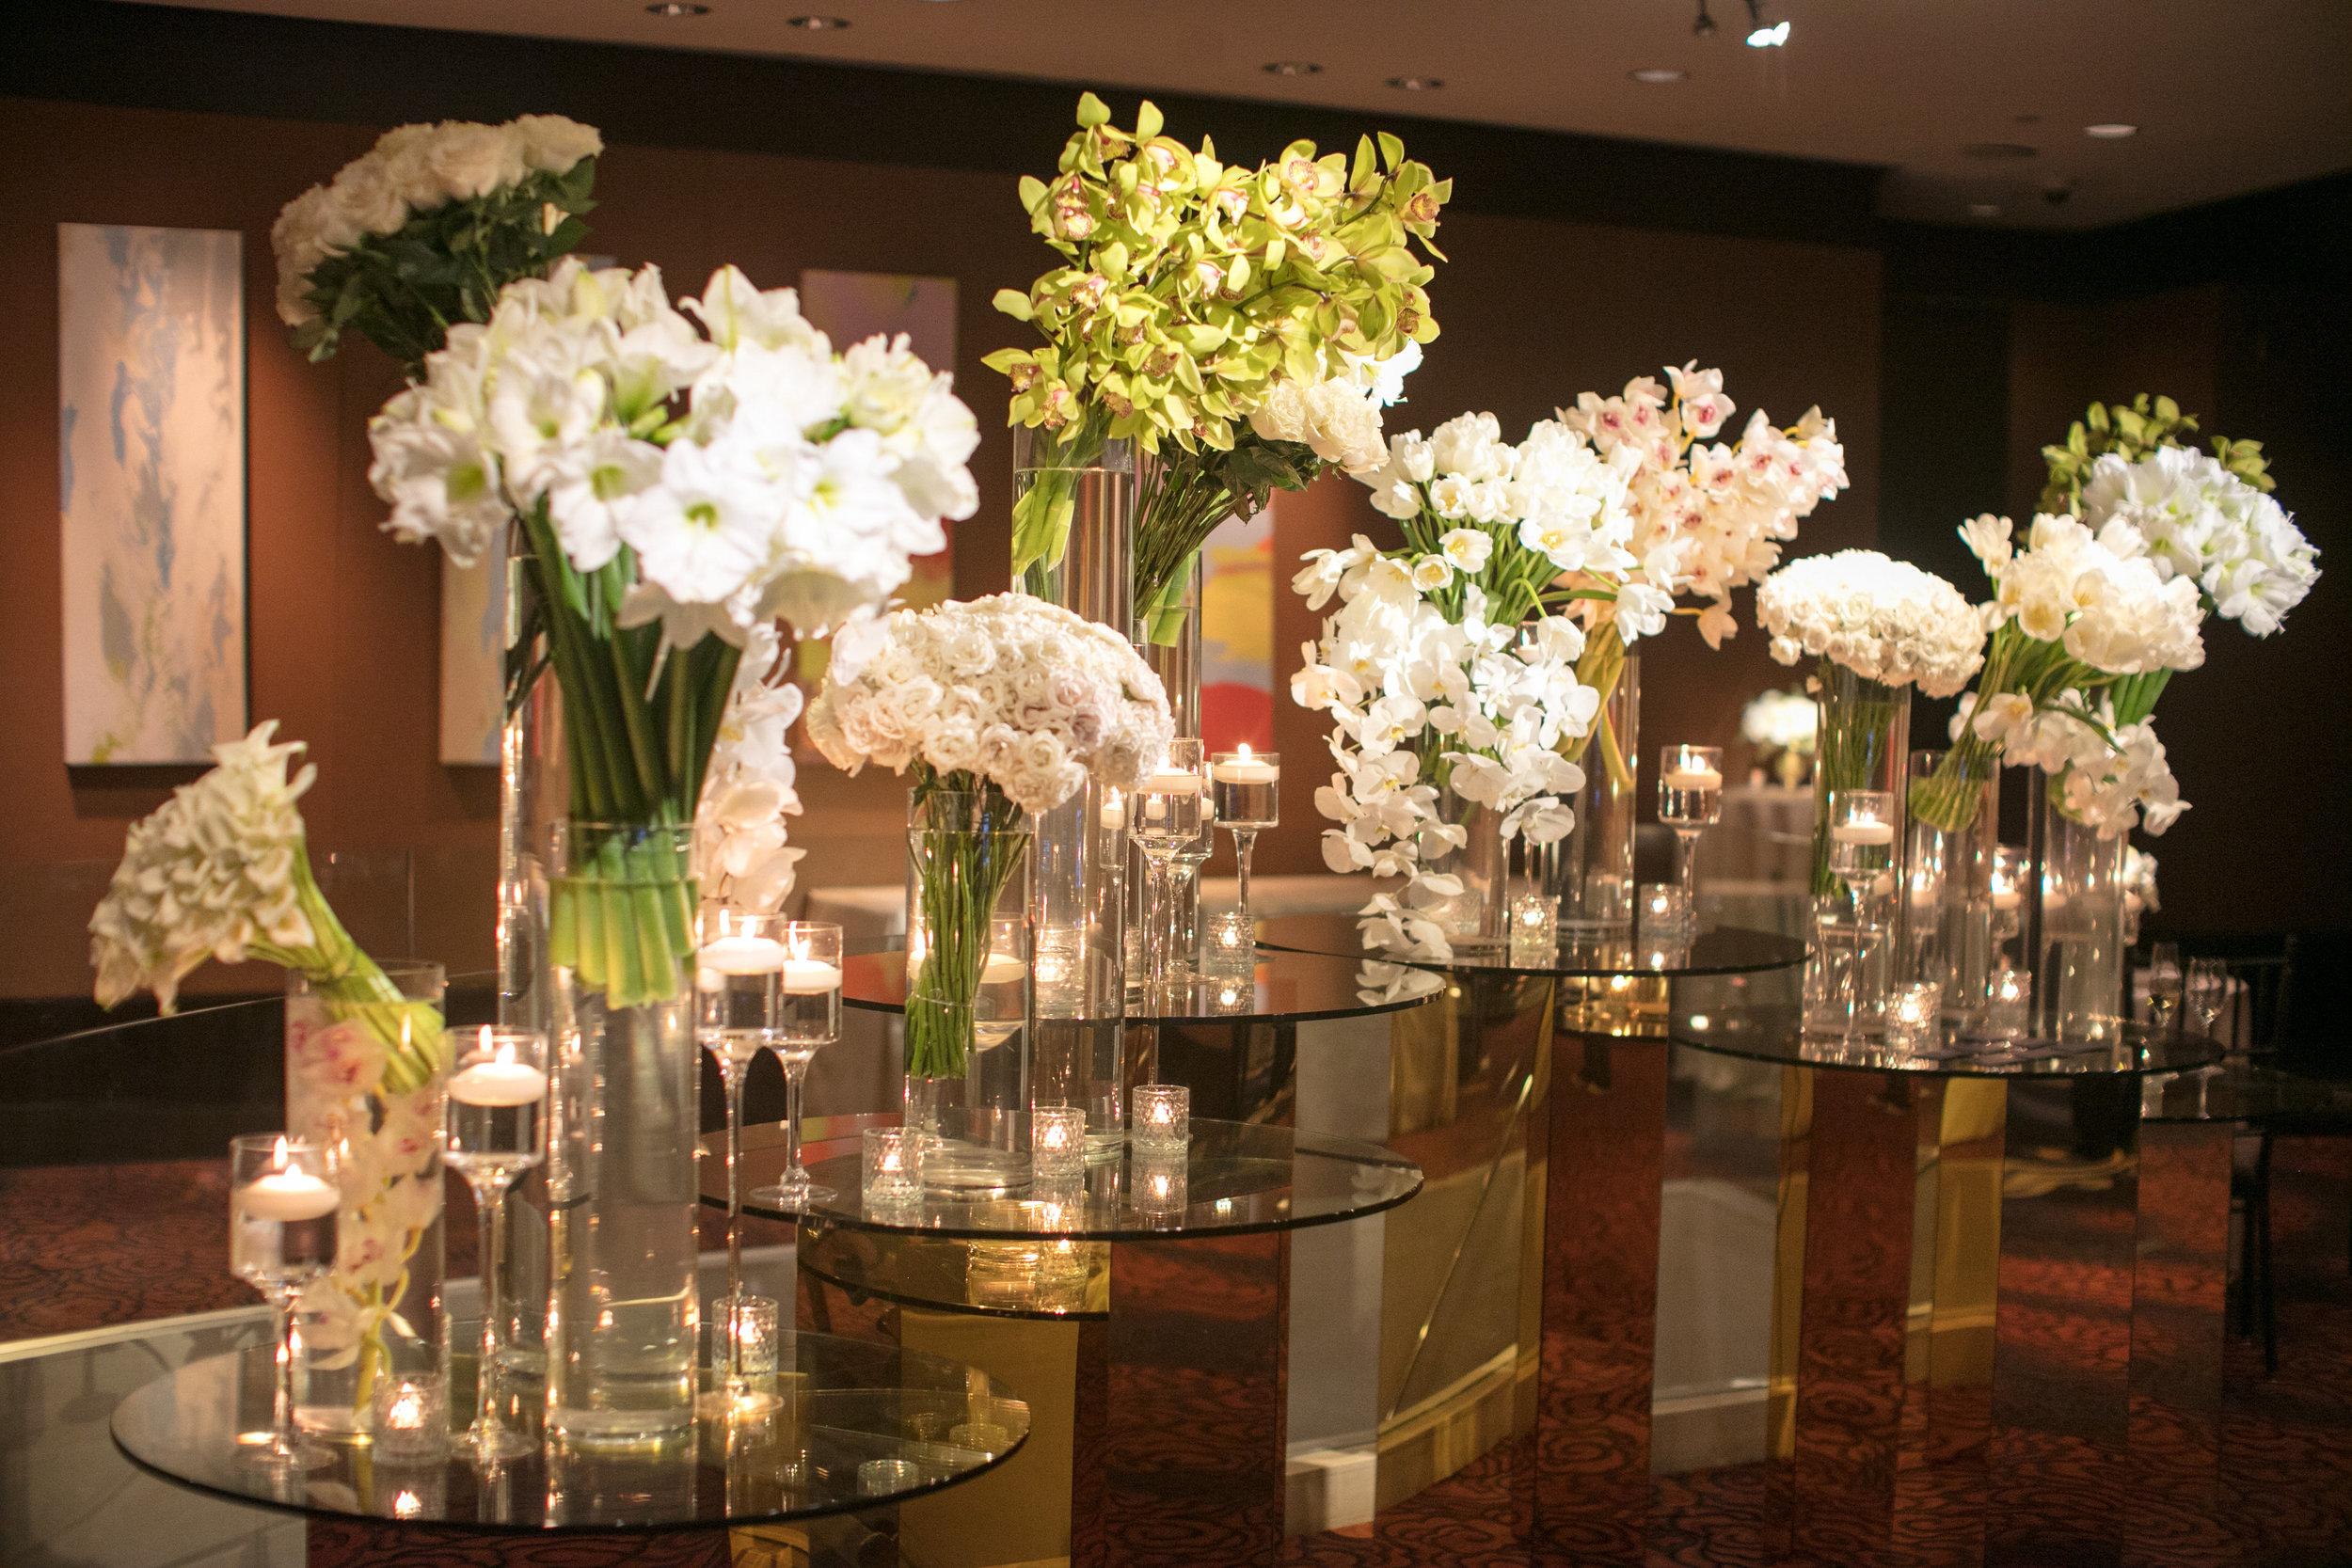 Andrea-Freeman-Events-NY-Wedding-Planner-Mandarin-Oriental-Wedding-1.jpg